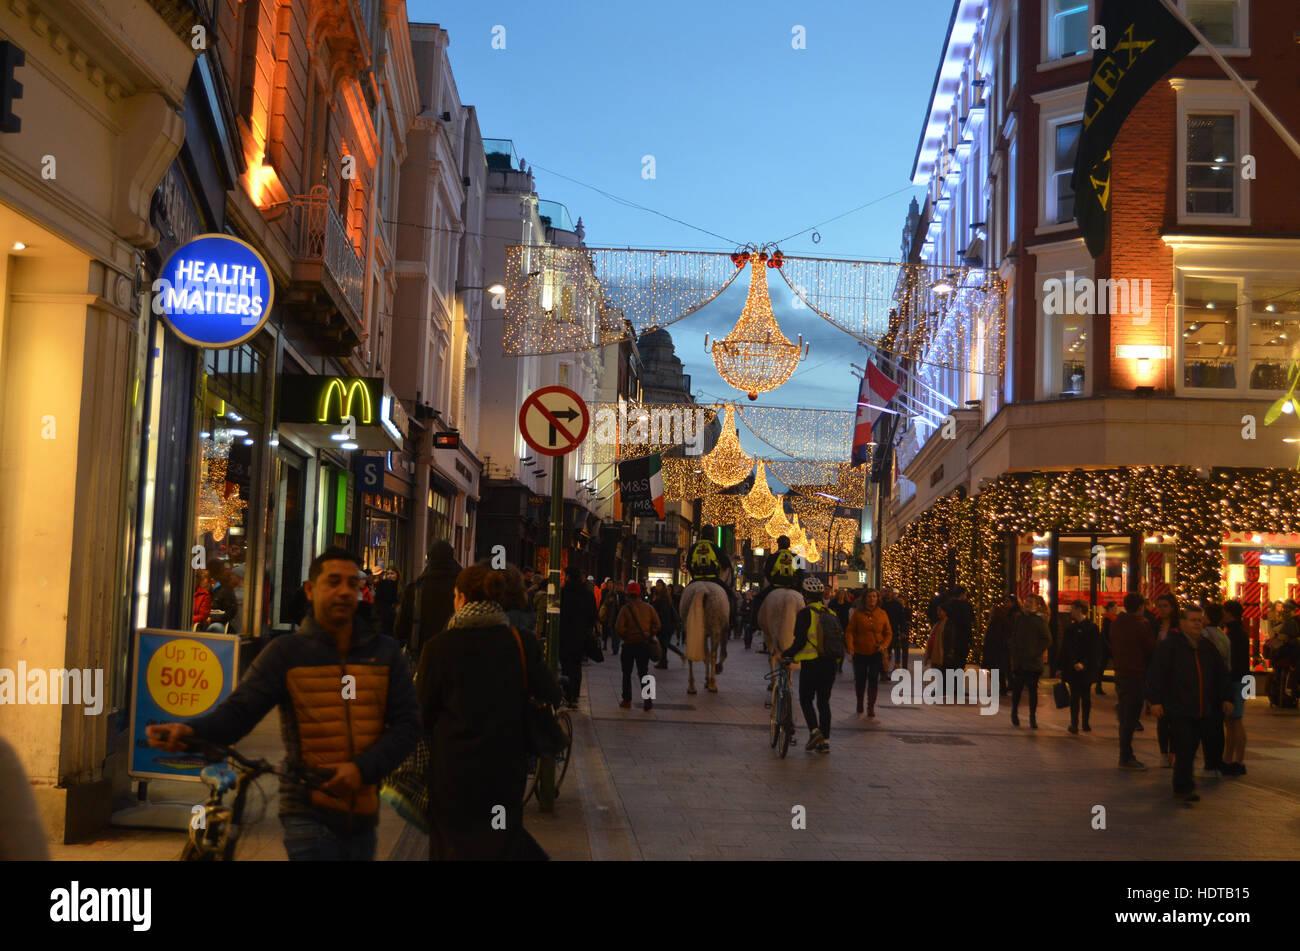 Las luces de Navidad en Grafton Street, Dublin, Irlanda Nov 2016 Imagen De Stock